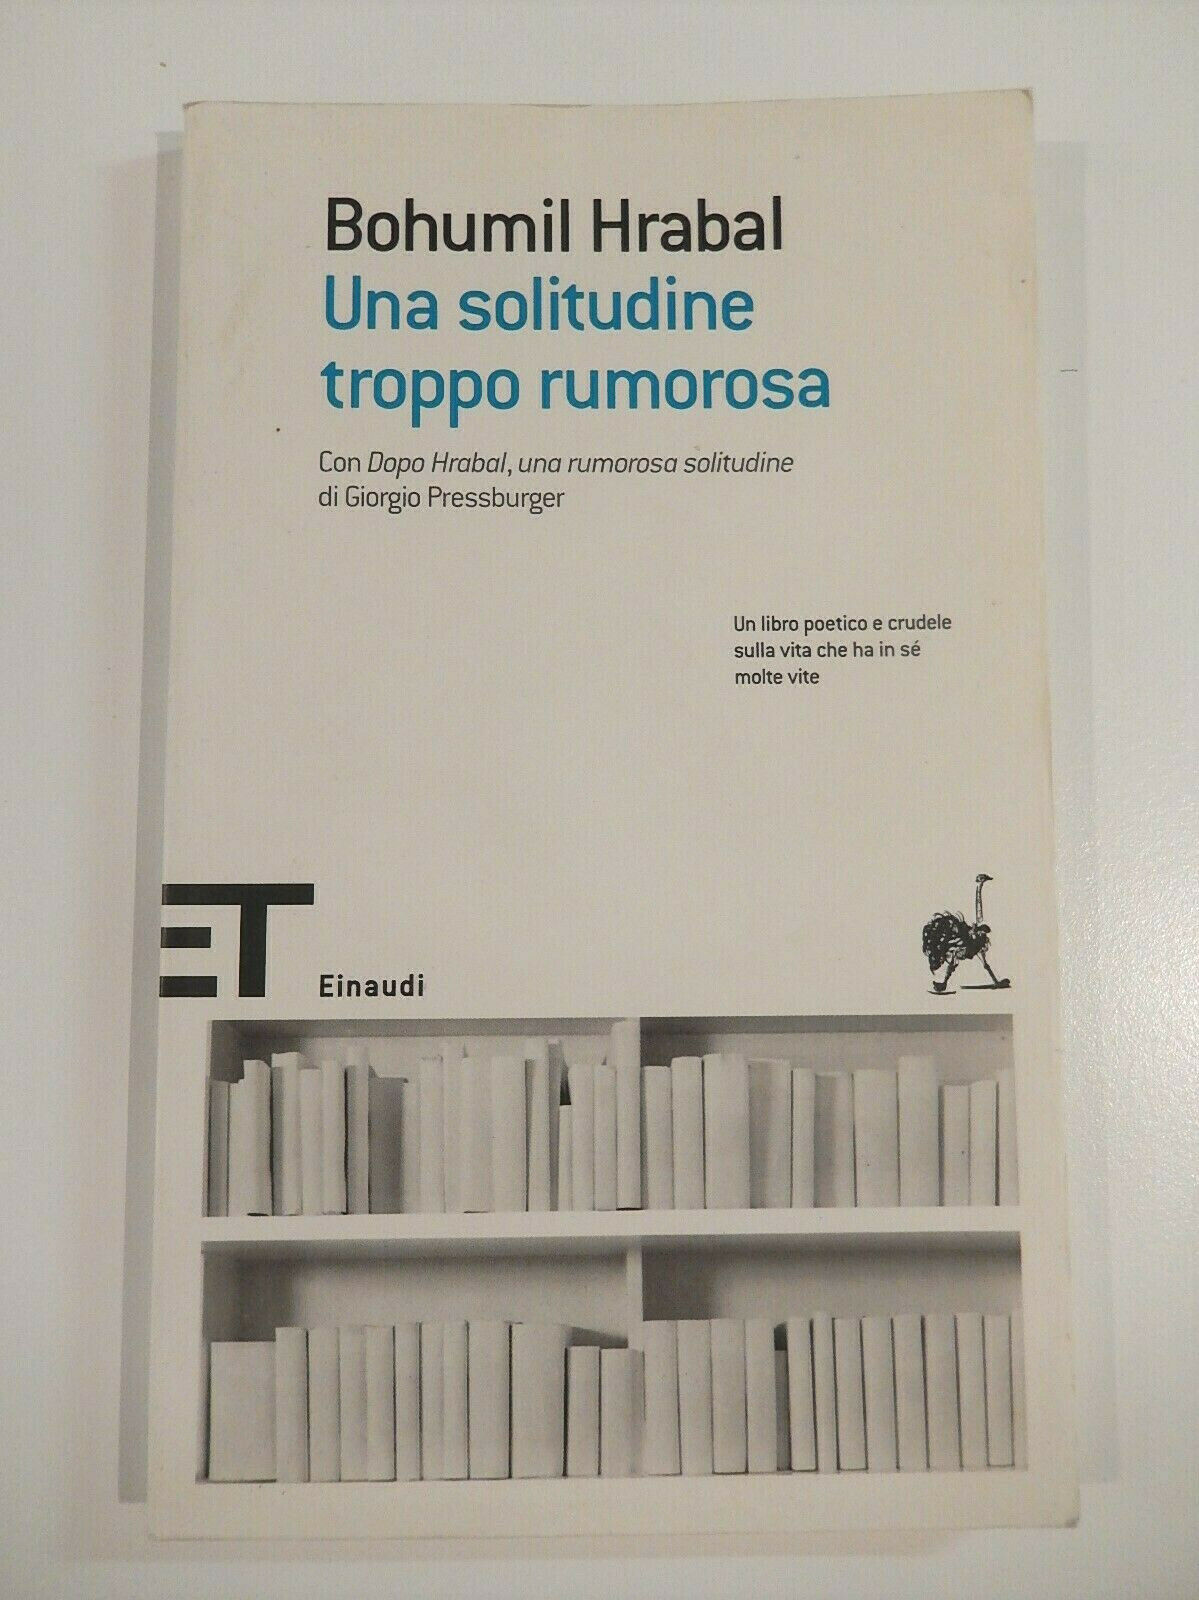 Bohumil Hrabal - Una solitudine troppo rumorosa (Einaudi ET 2009) OTTIMO!